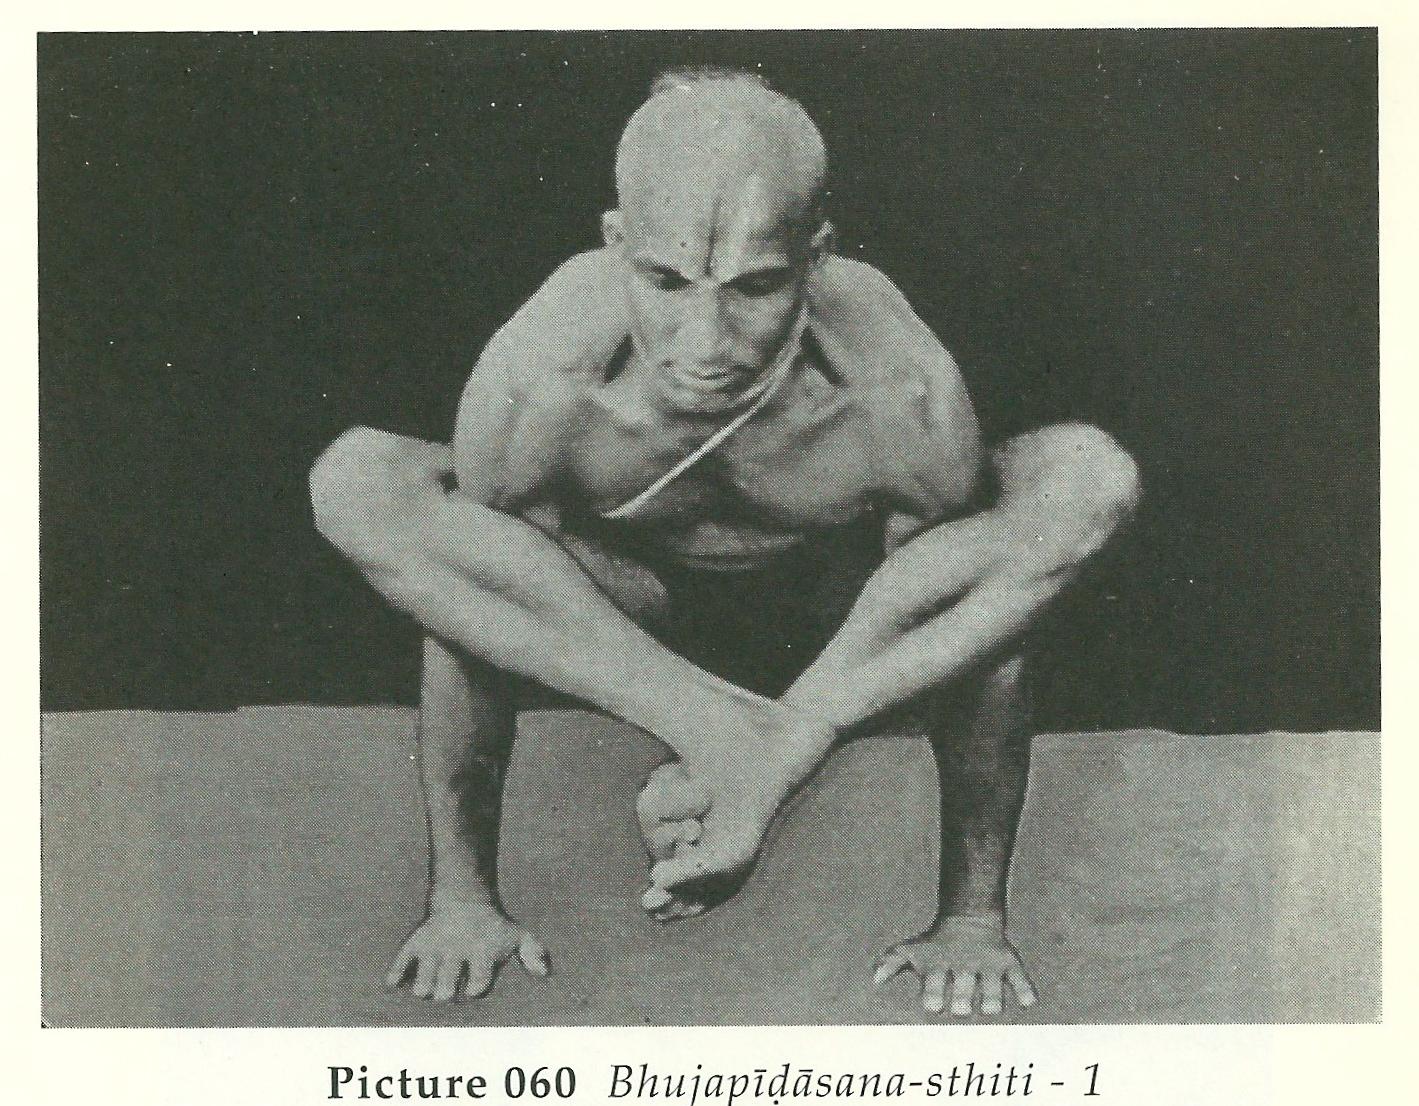 From Krishnamacharya's Yoga Makaranda